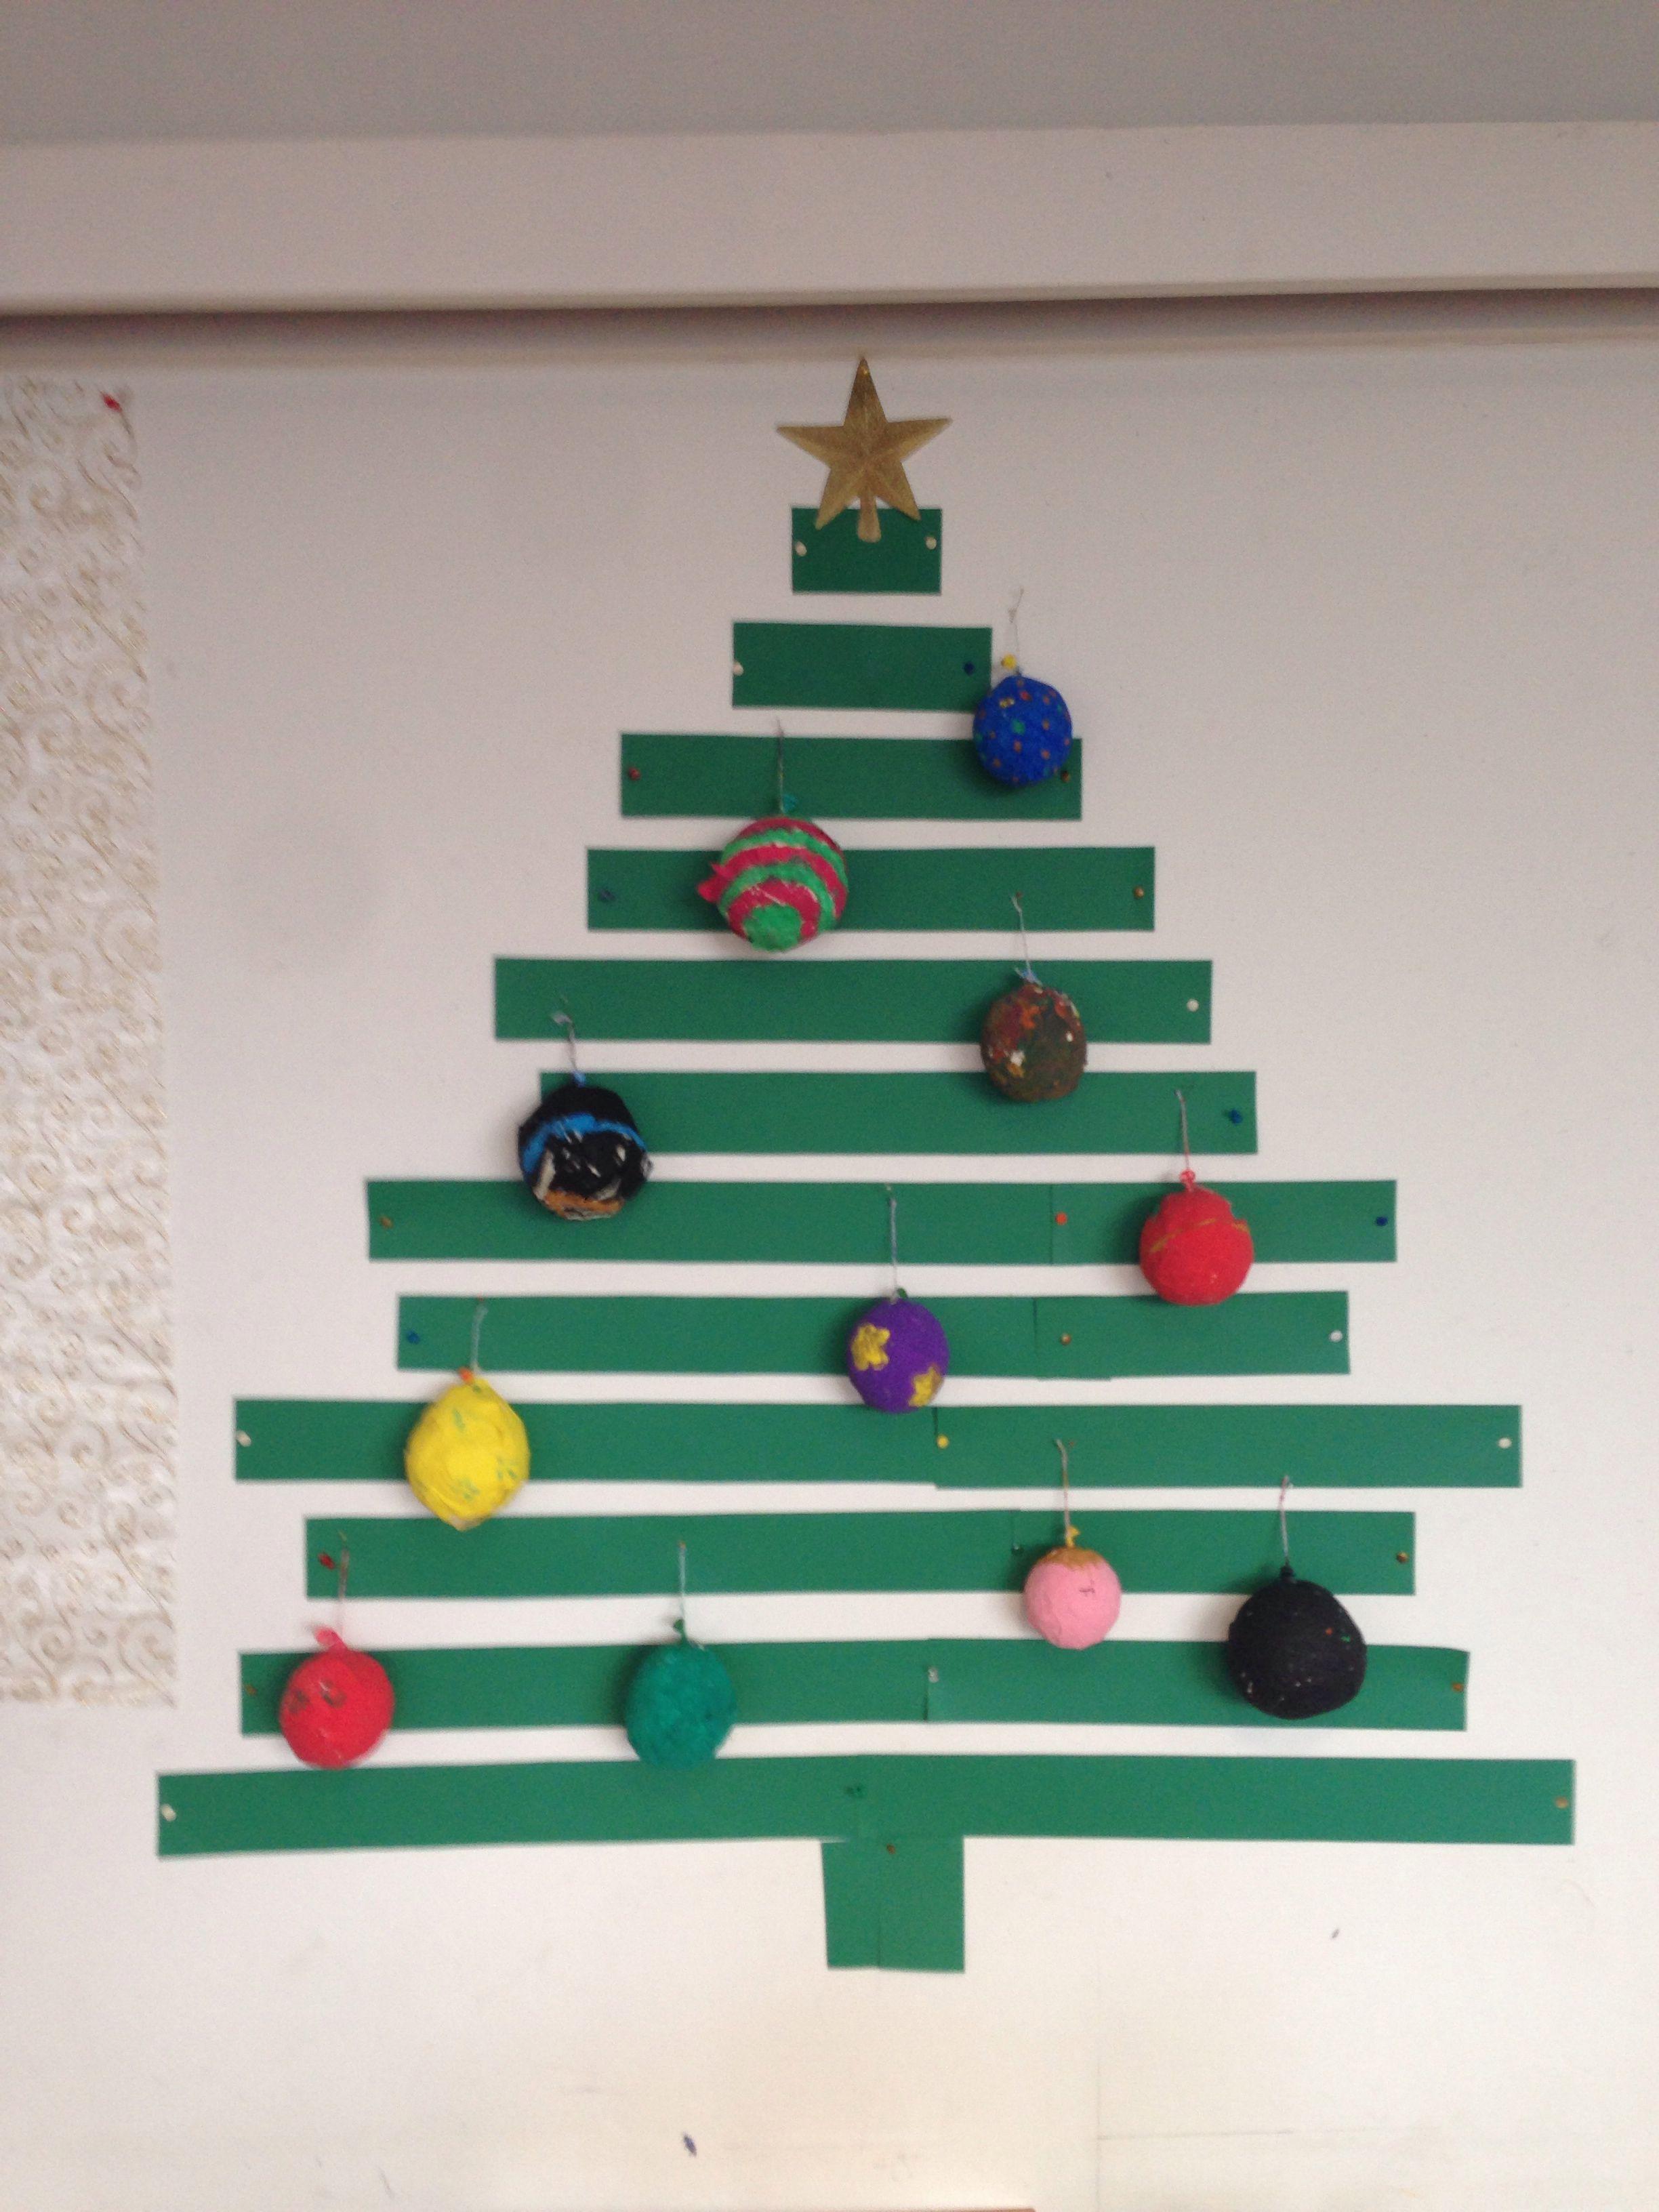 Zelfgemaakte Lelijke Kerstboom Alette Lanting